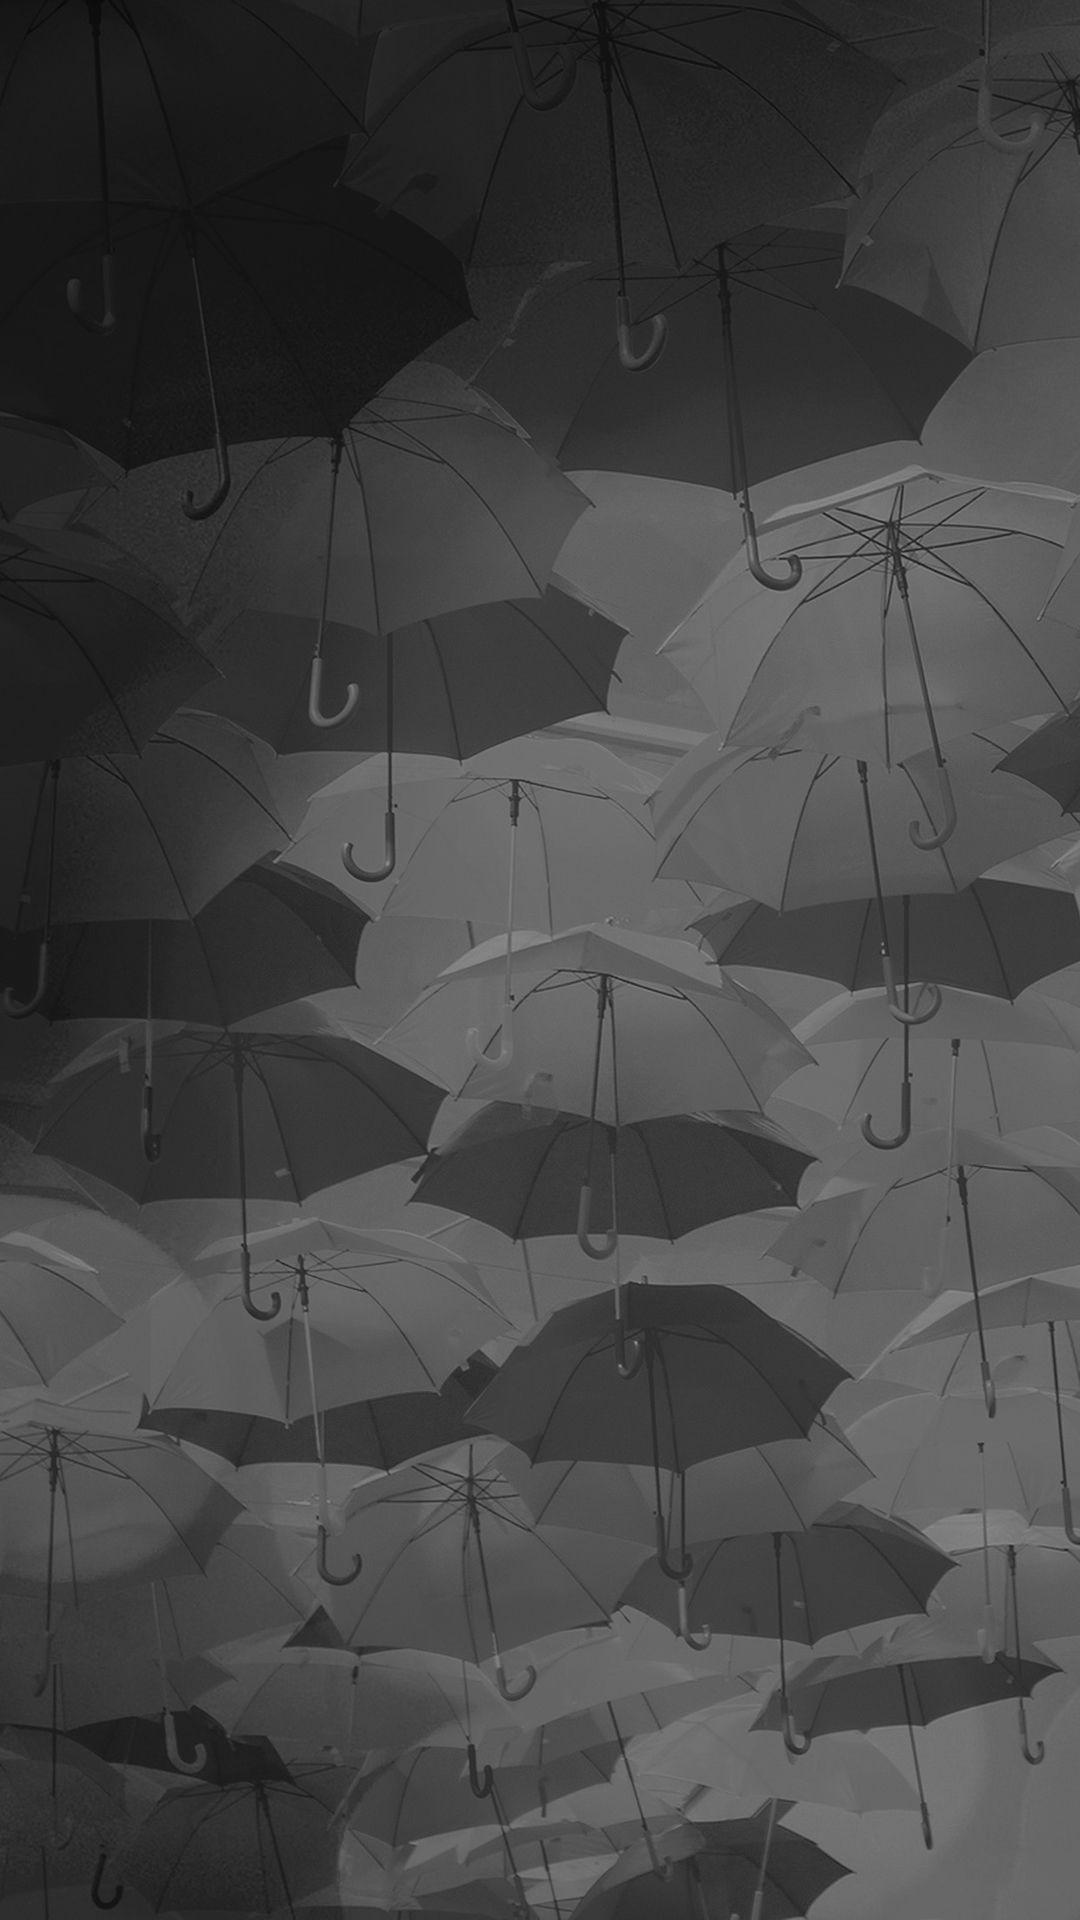 Umbrella party dark pattern iphone 6 plus wallpaper